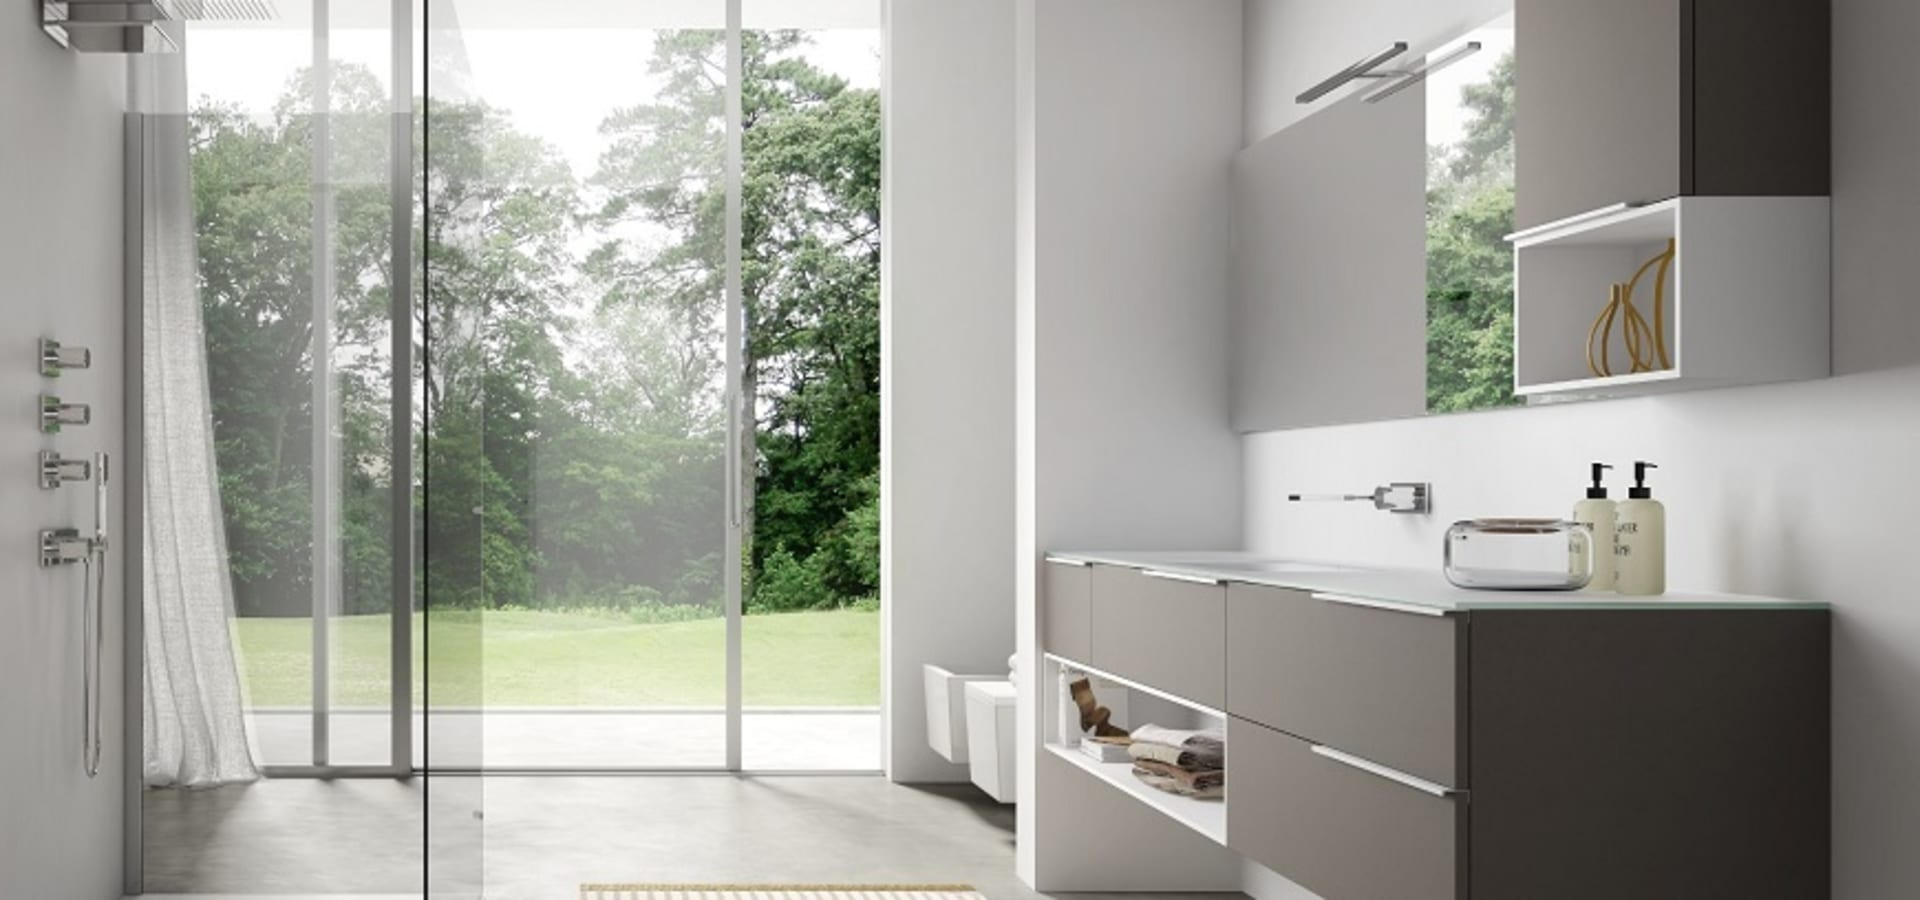 Arredo bagno moderno von Arredo Bagno Milano | homify